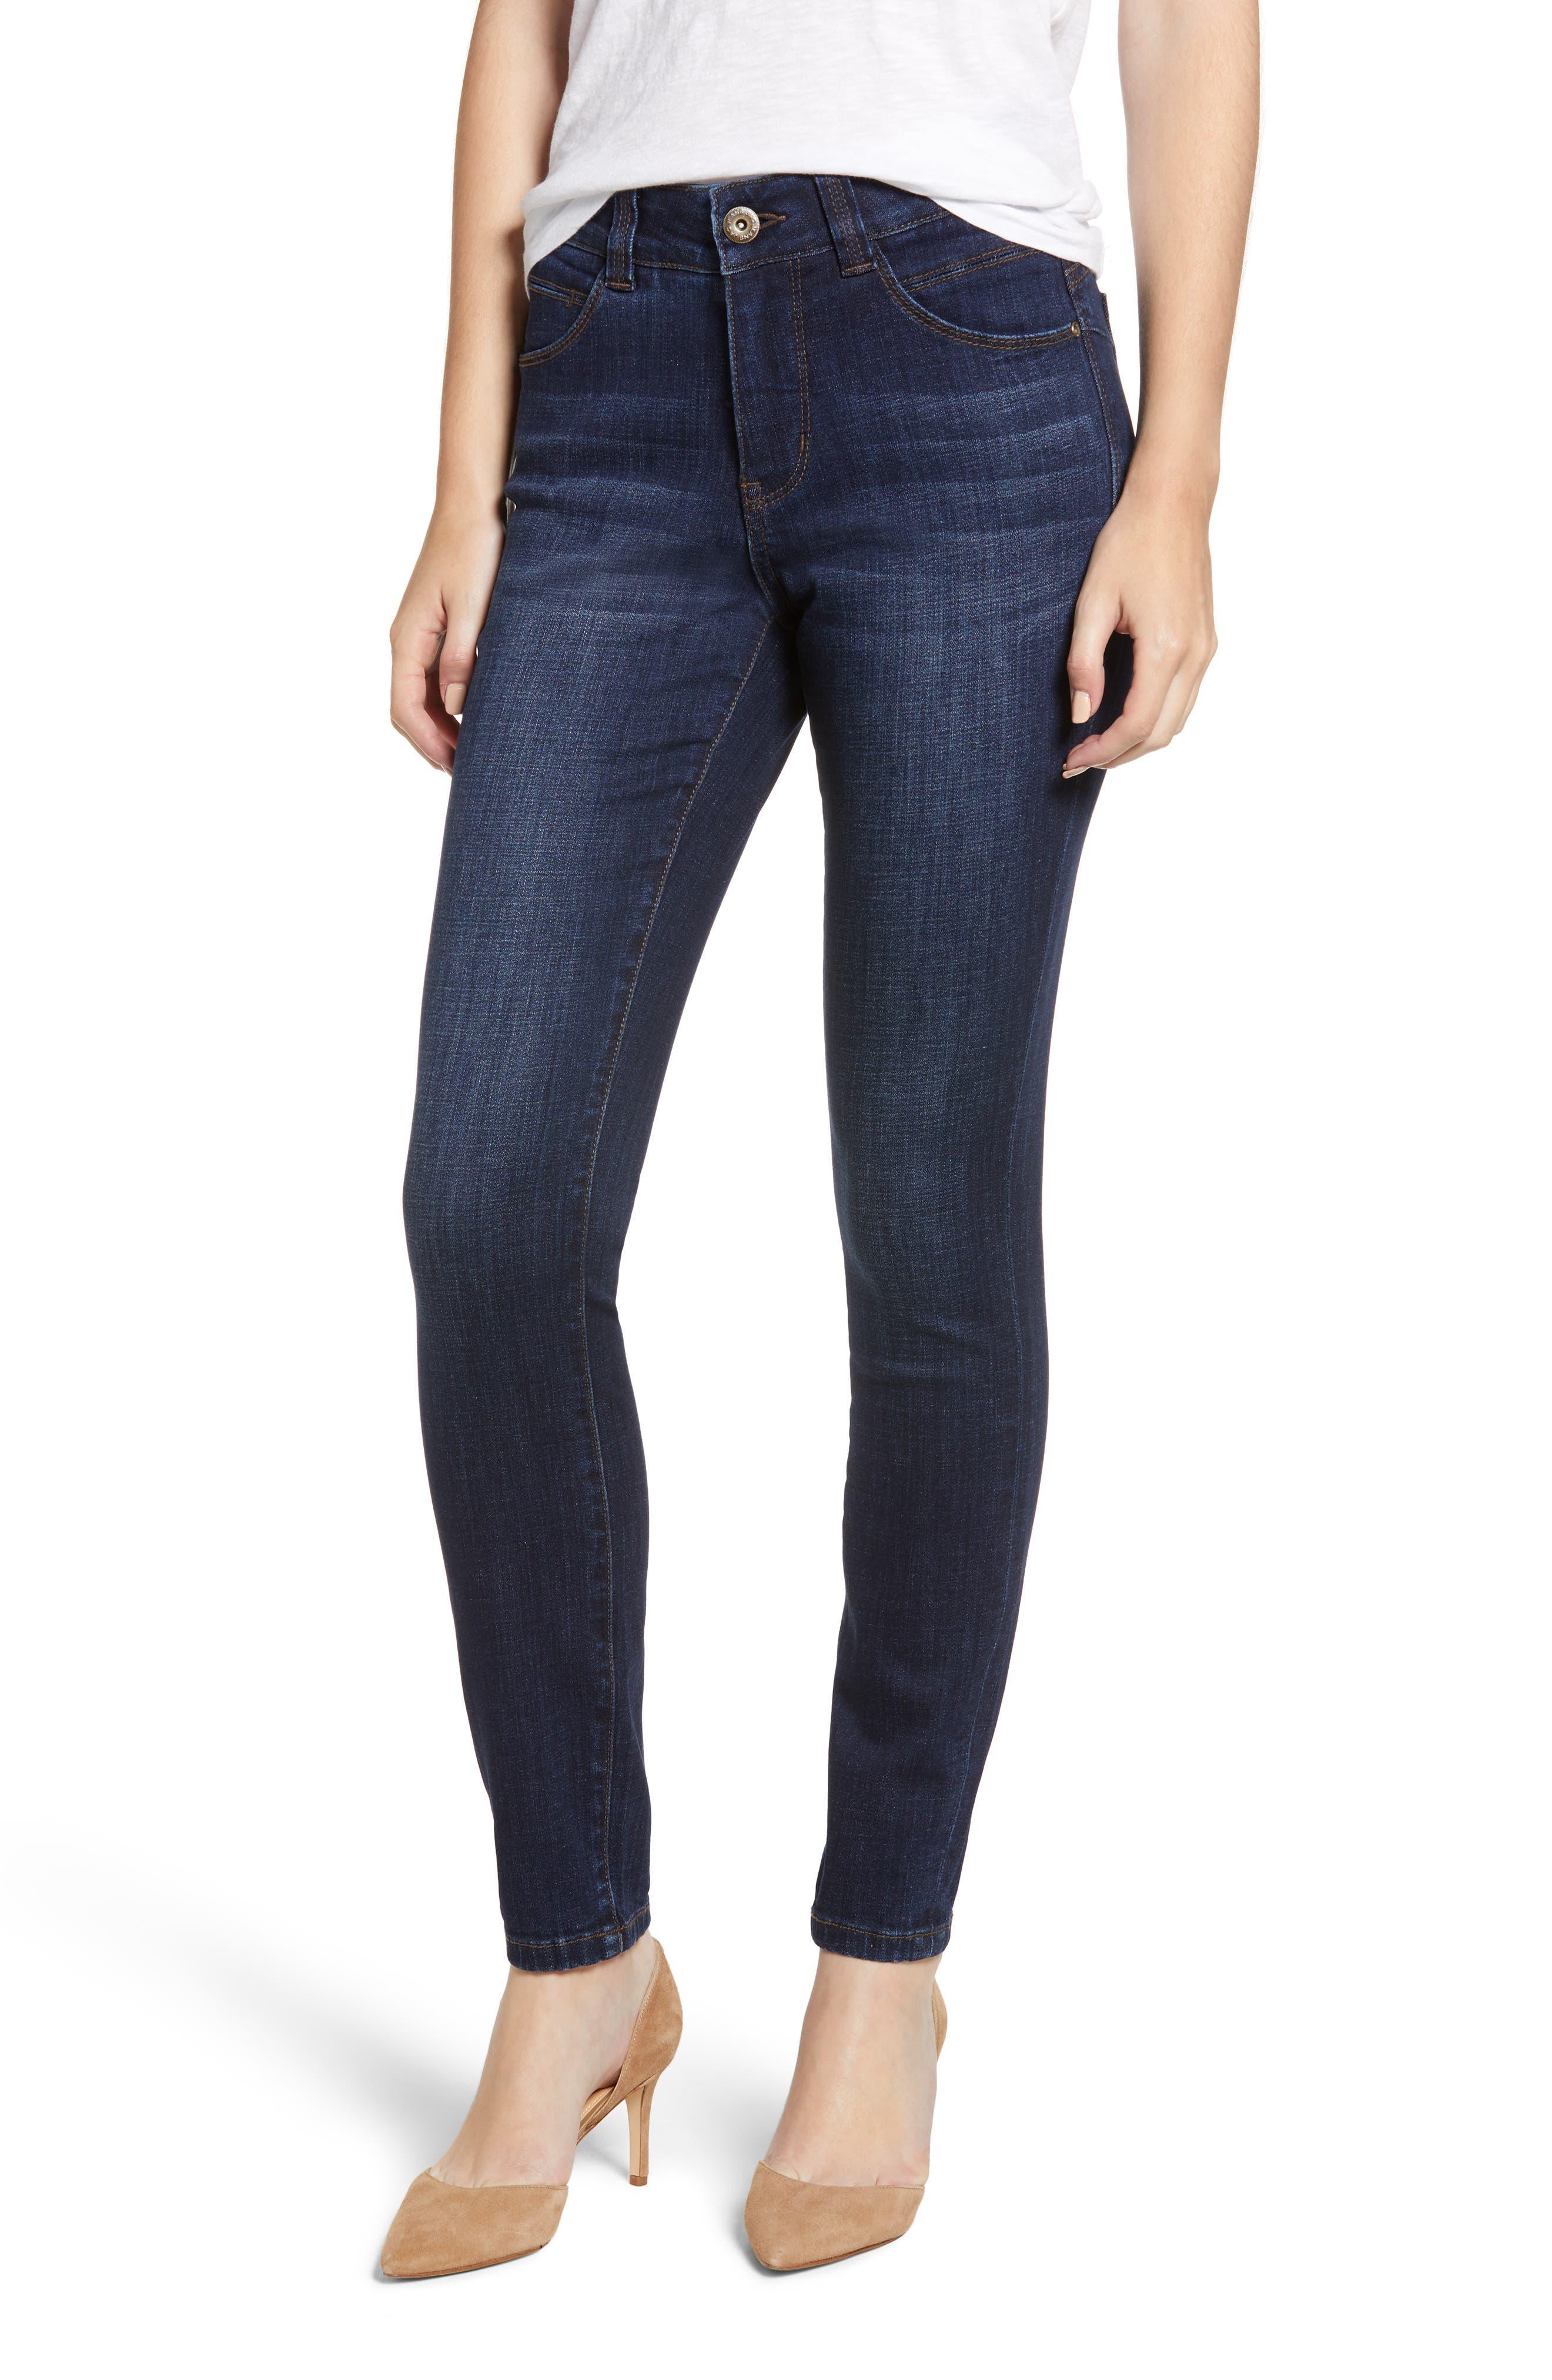 Women's Jag Jeans Cecilia Stretch Skinny Jeans